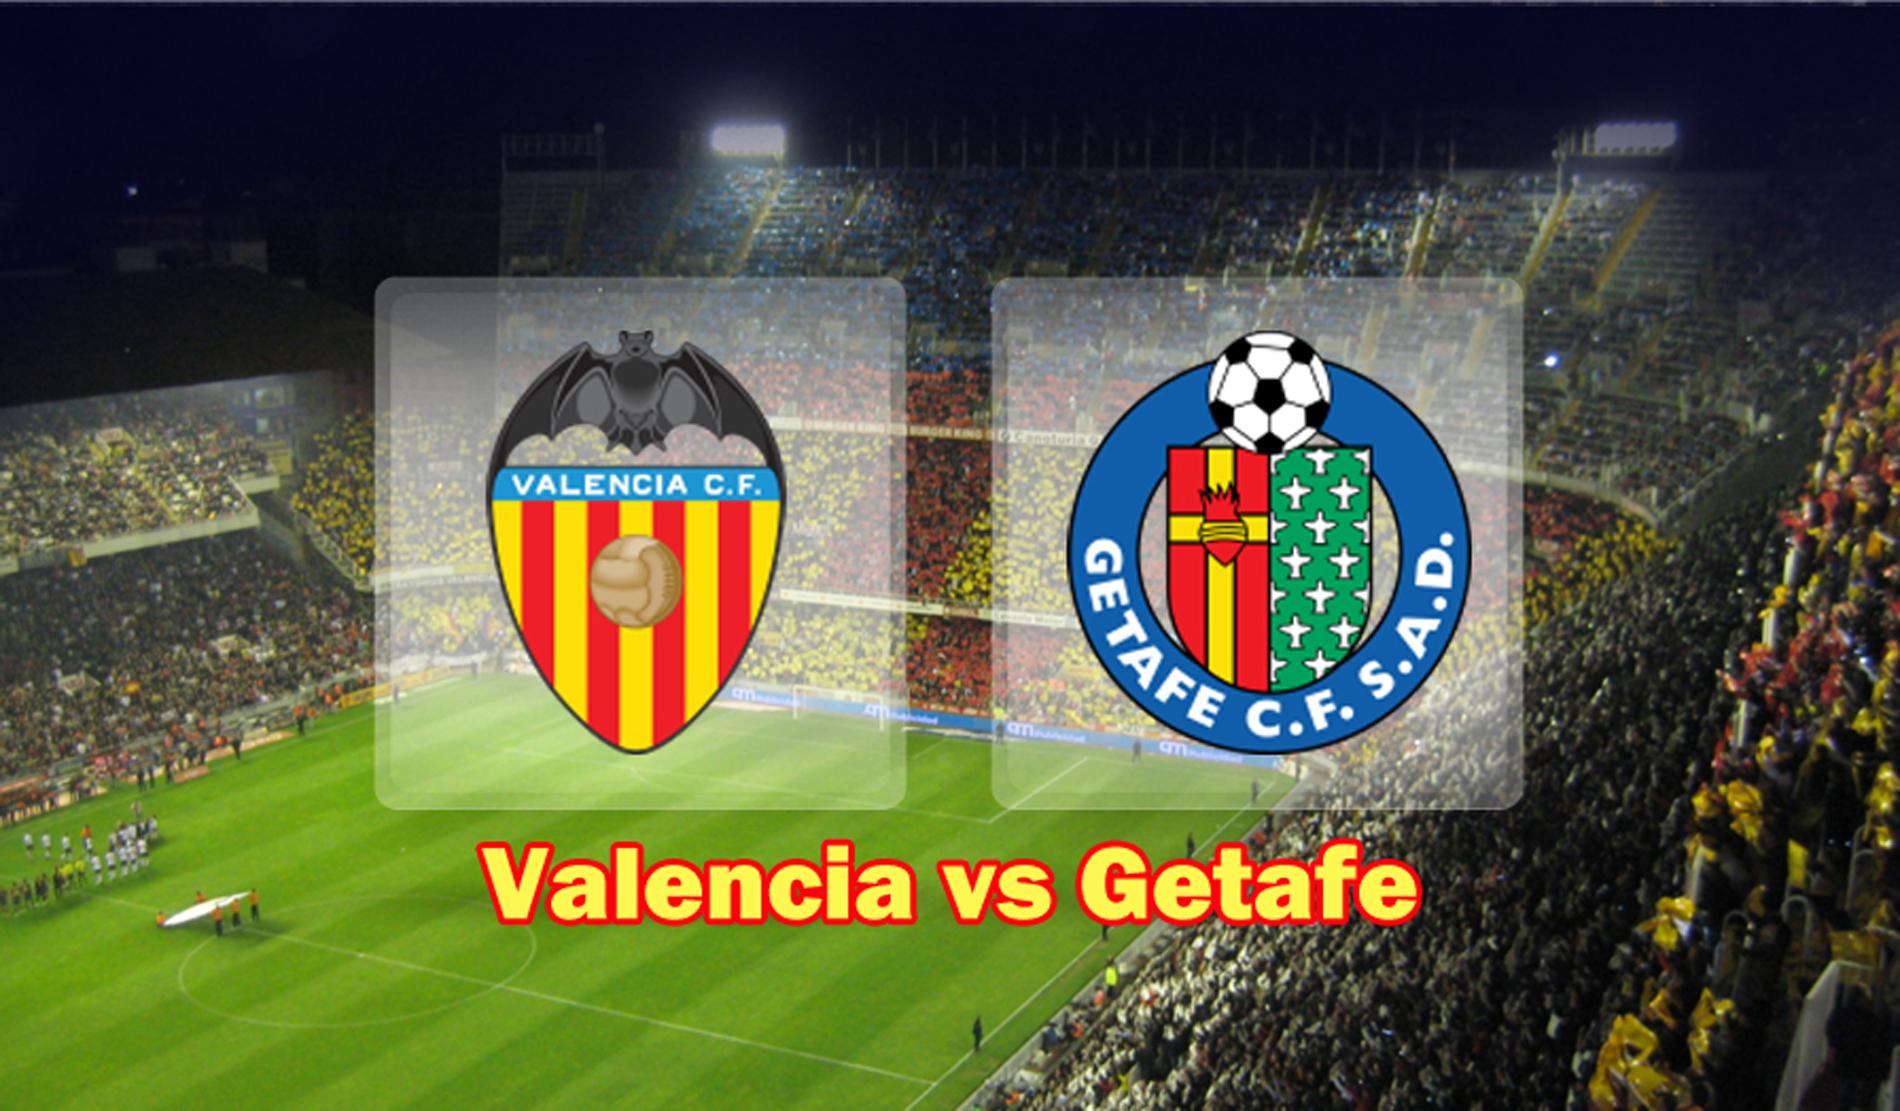 tip-keo-bong-da-ngay-19-04-2018-valencia-vs-getafe-1